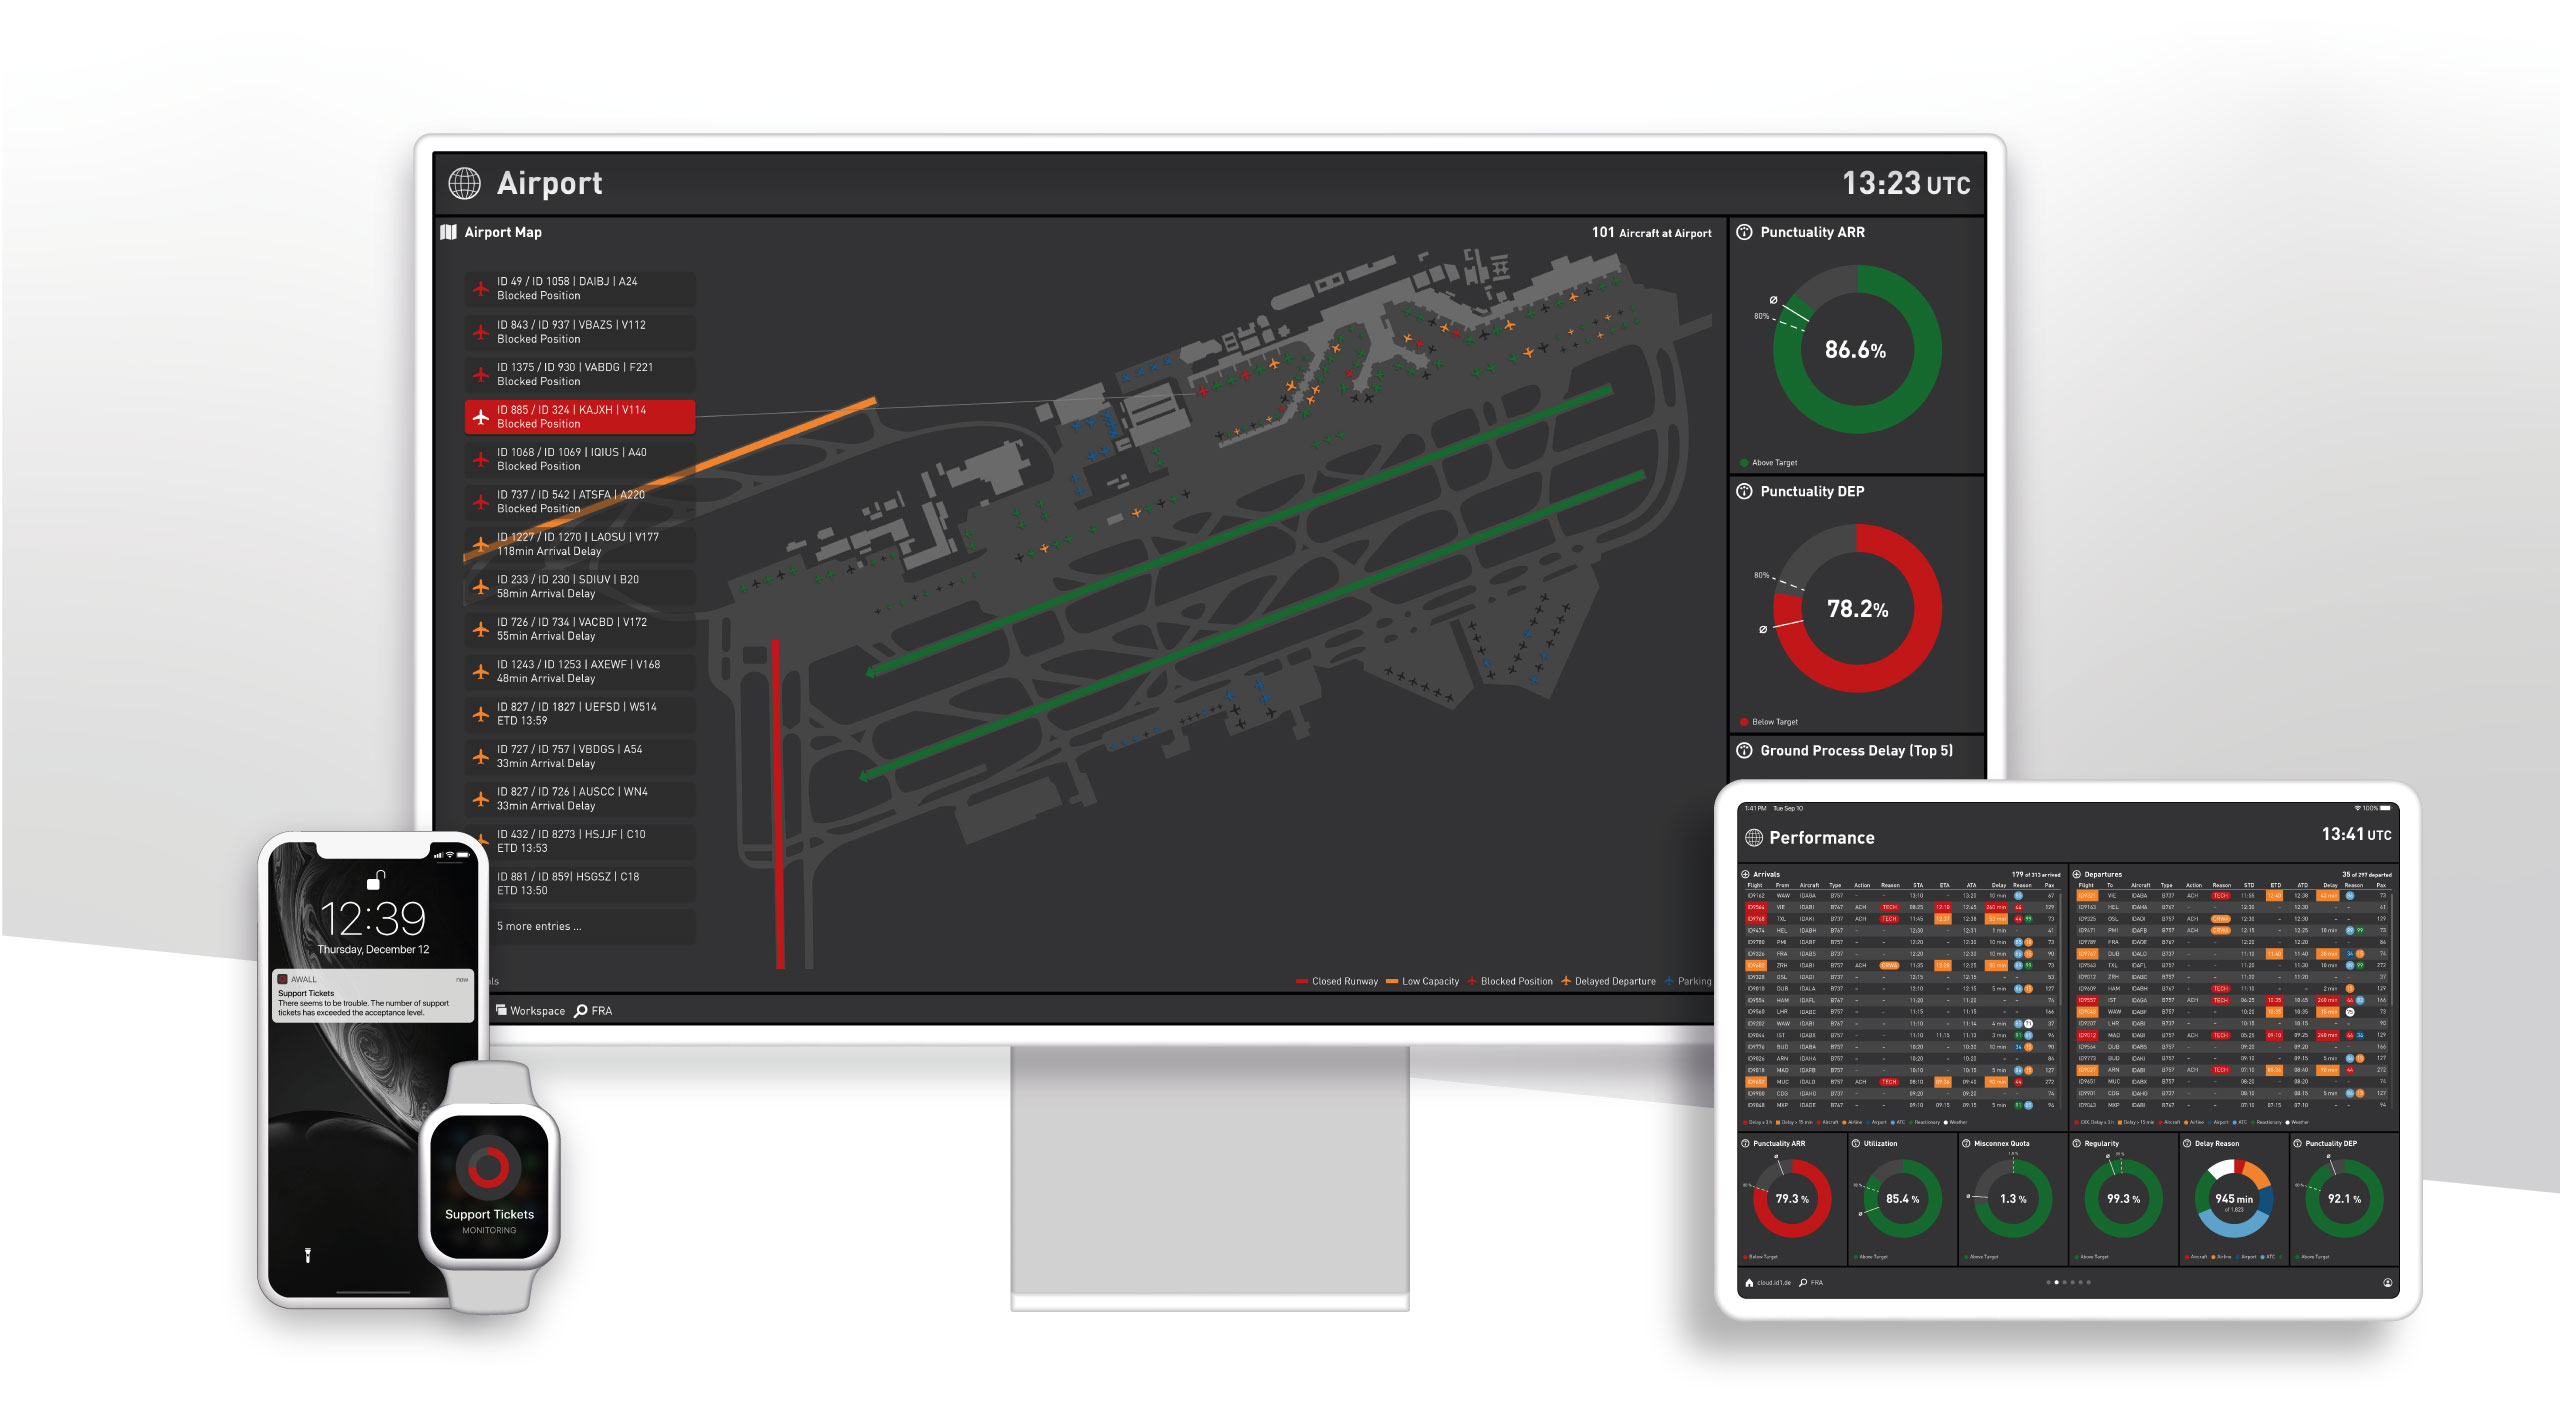 //www.id1.de/wp-content/uploads/2021/01/Operations-Management-Header.jpg